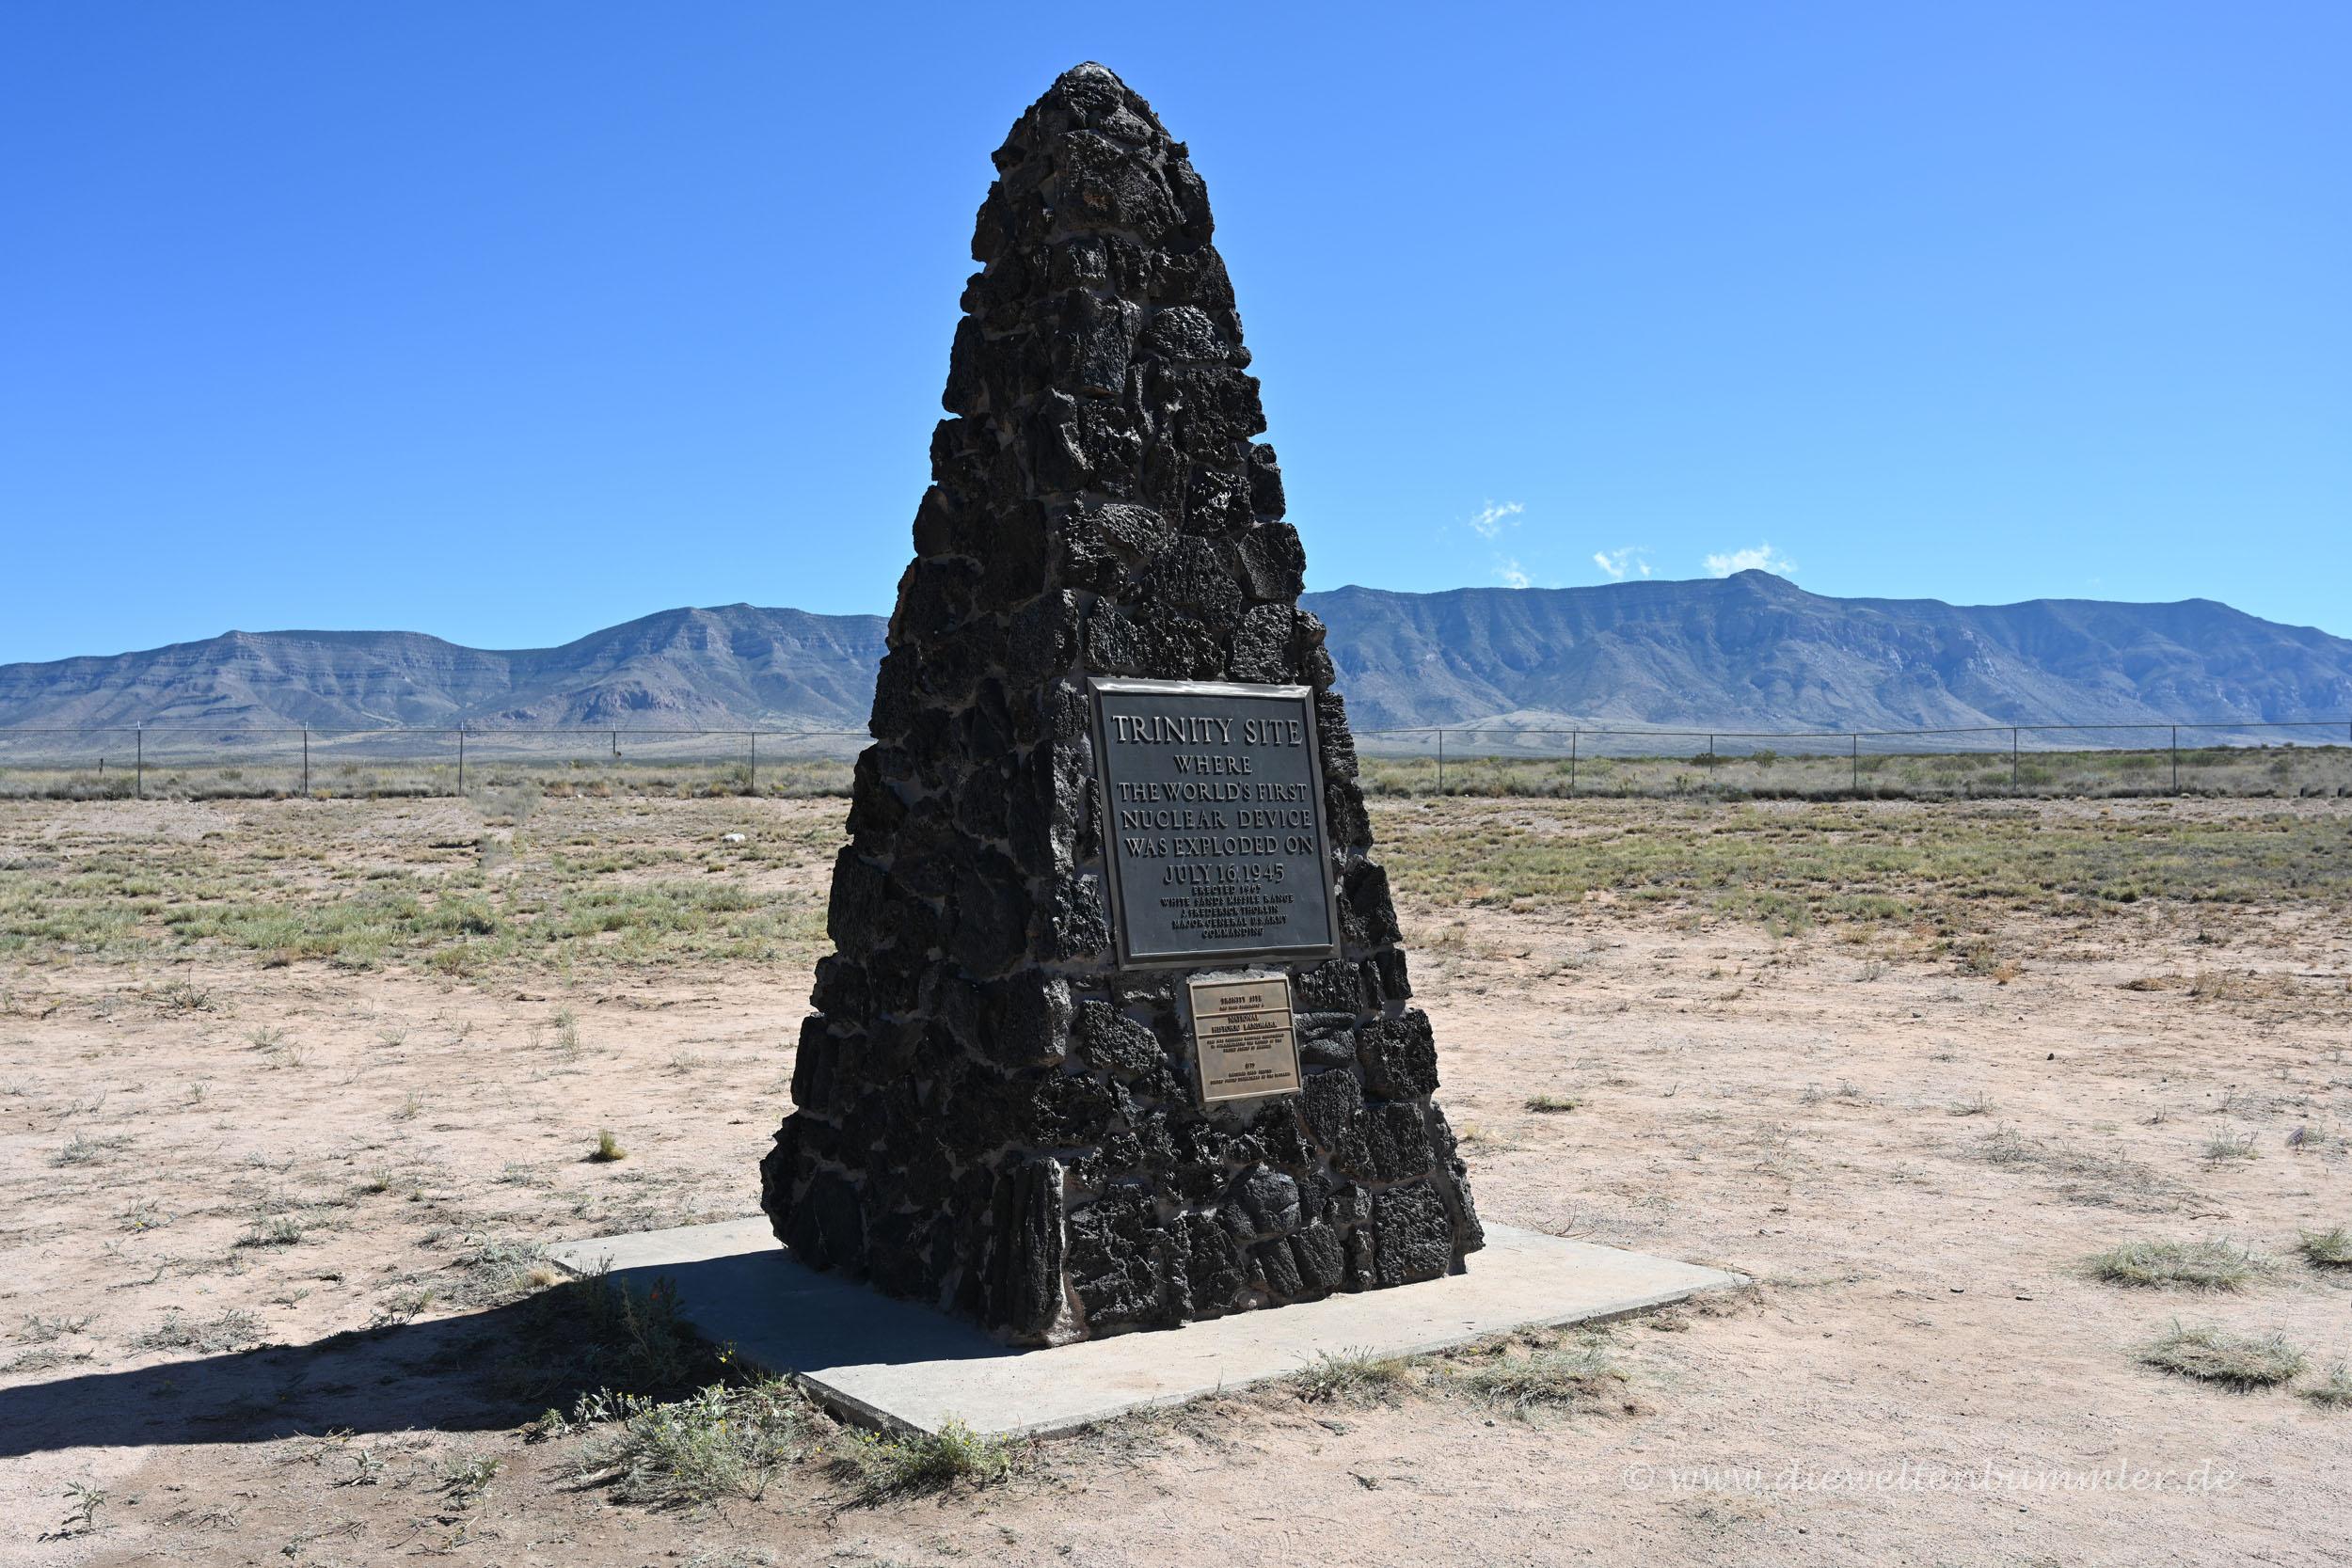 Obelisk an der Trinity Test Site